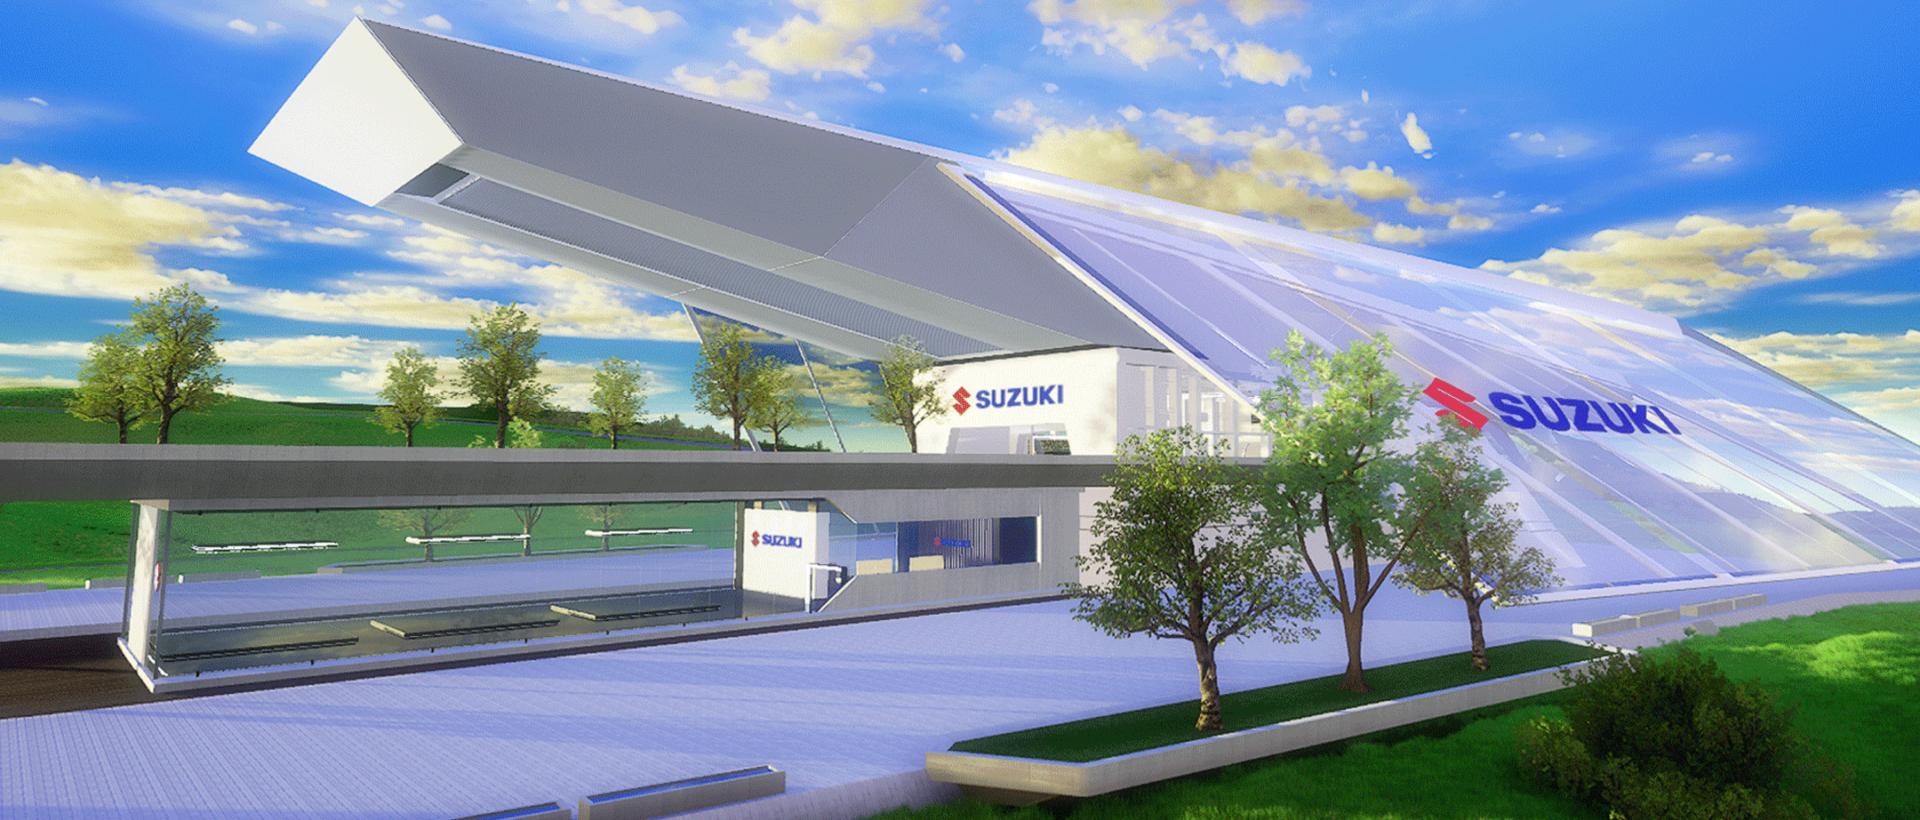 Image courtesy Suzuki Motor of America, Inc.